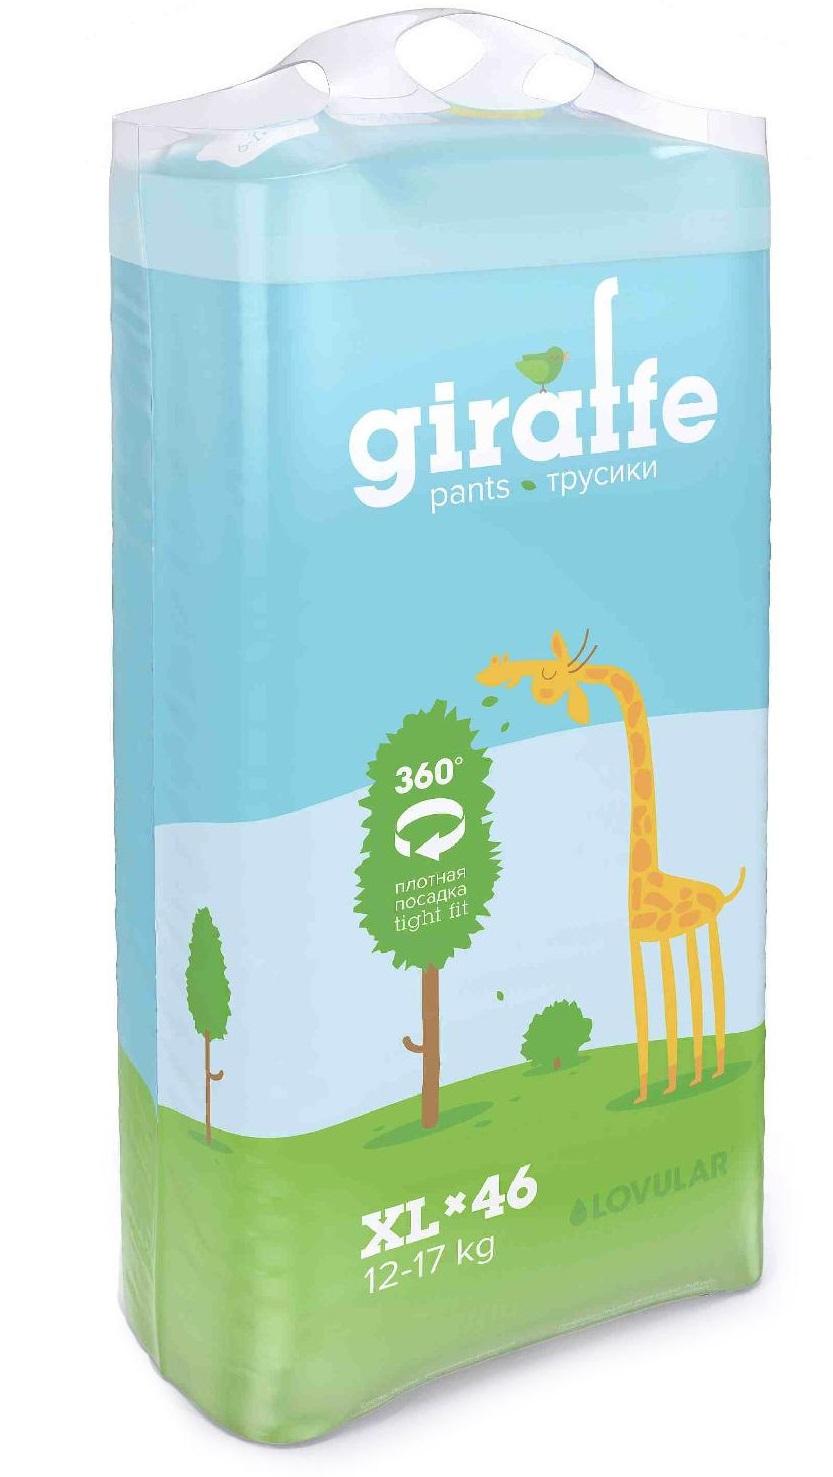 Подгузники-трусики Giraffe Трусики-подгузники Giraffe XL (12-17 кг) 46 шт. трусики подгузники lovular giraffe xl 12 17 кг 46 шт